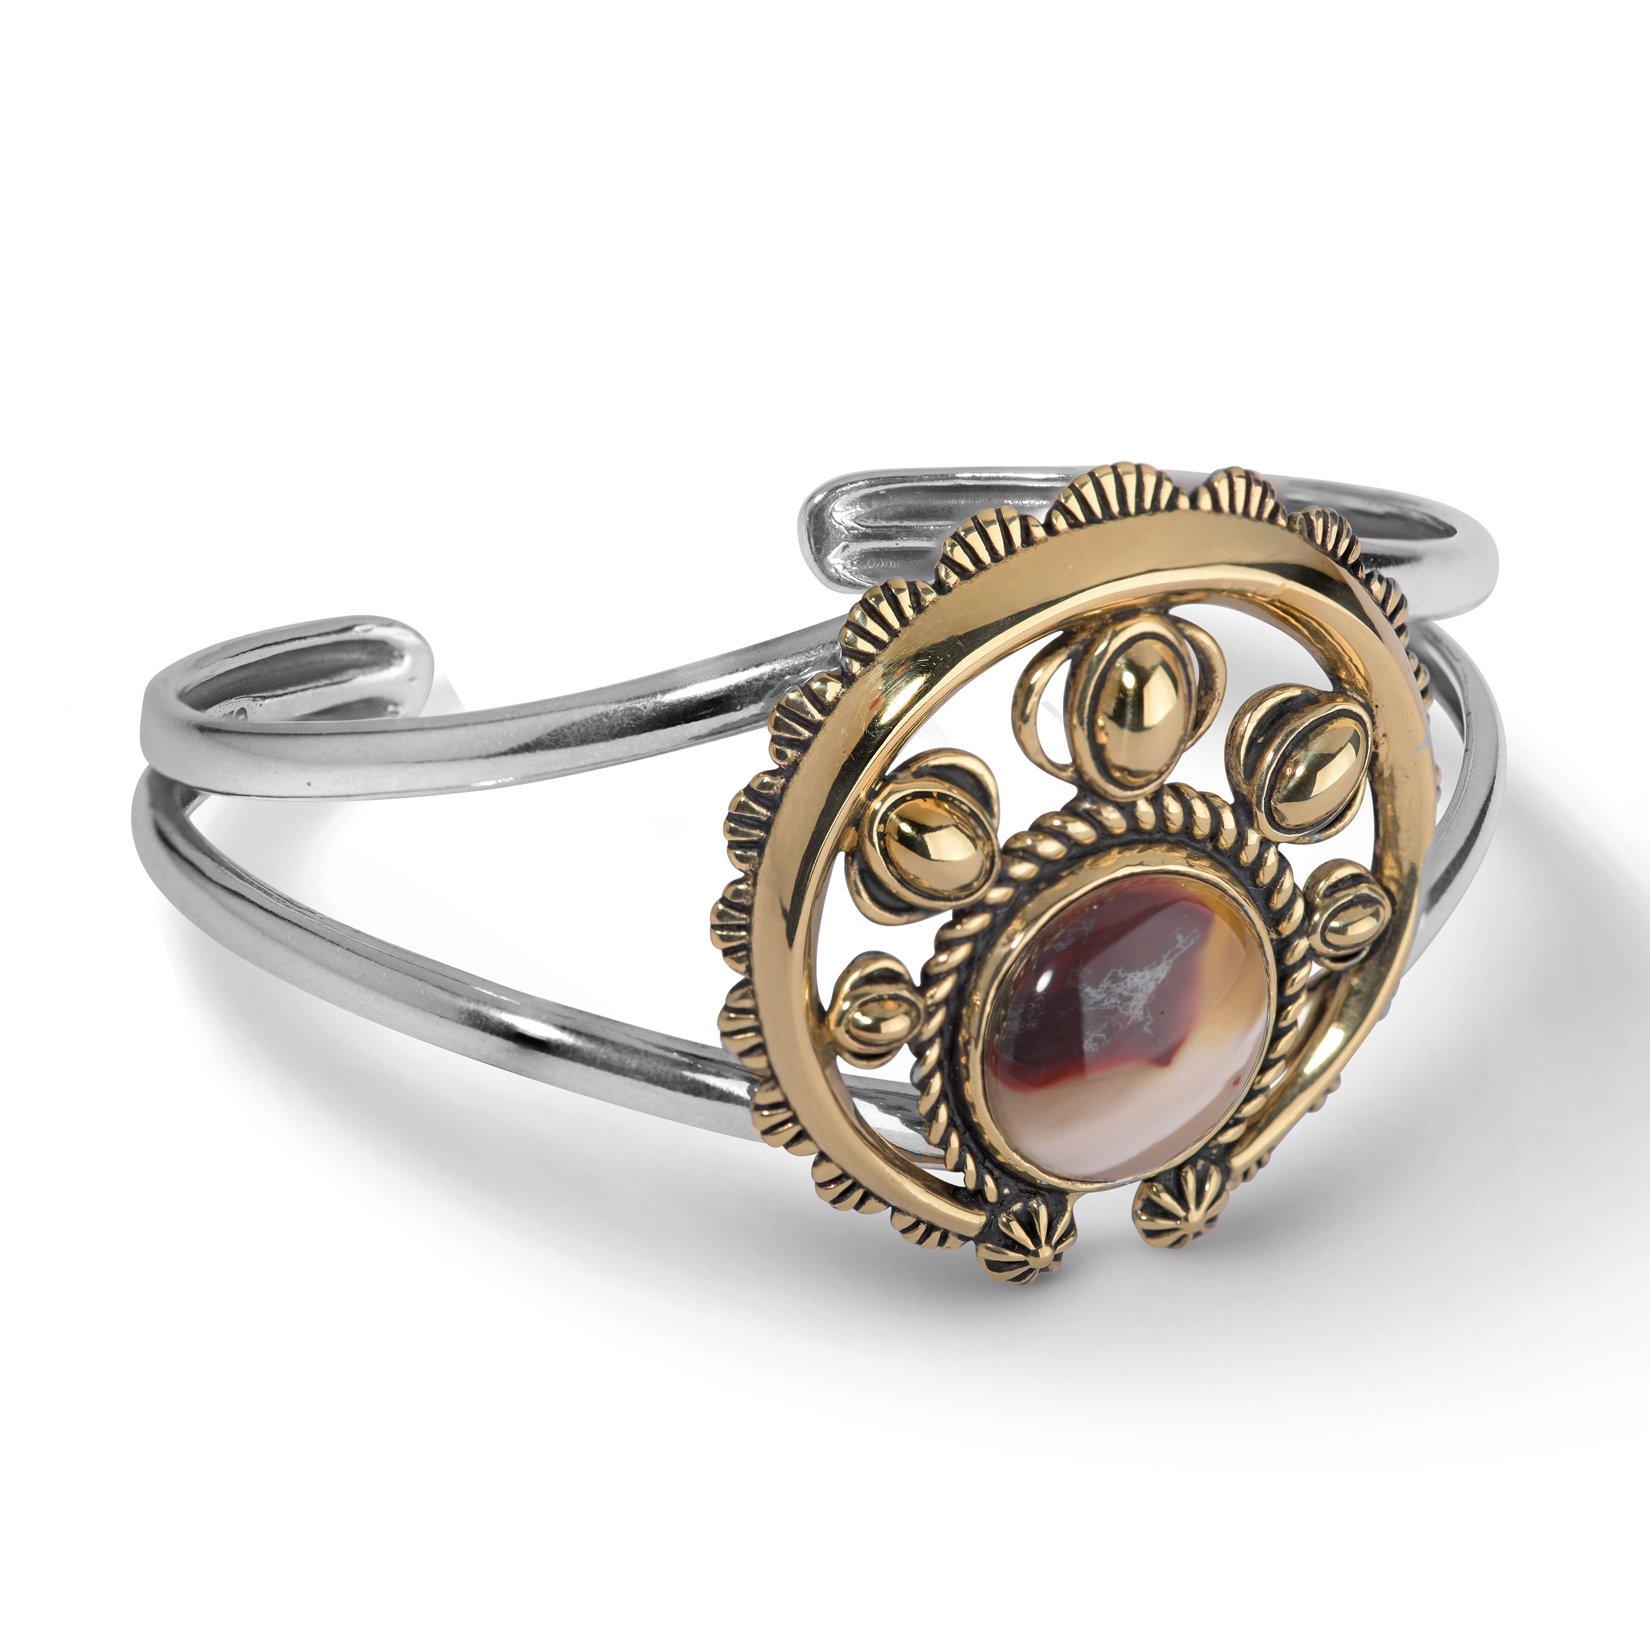 American West, Sterling Silver, Brass, & Mookite Agate Naja Cuff Bracelet